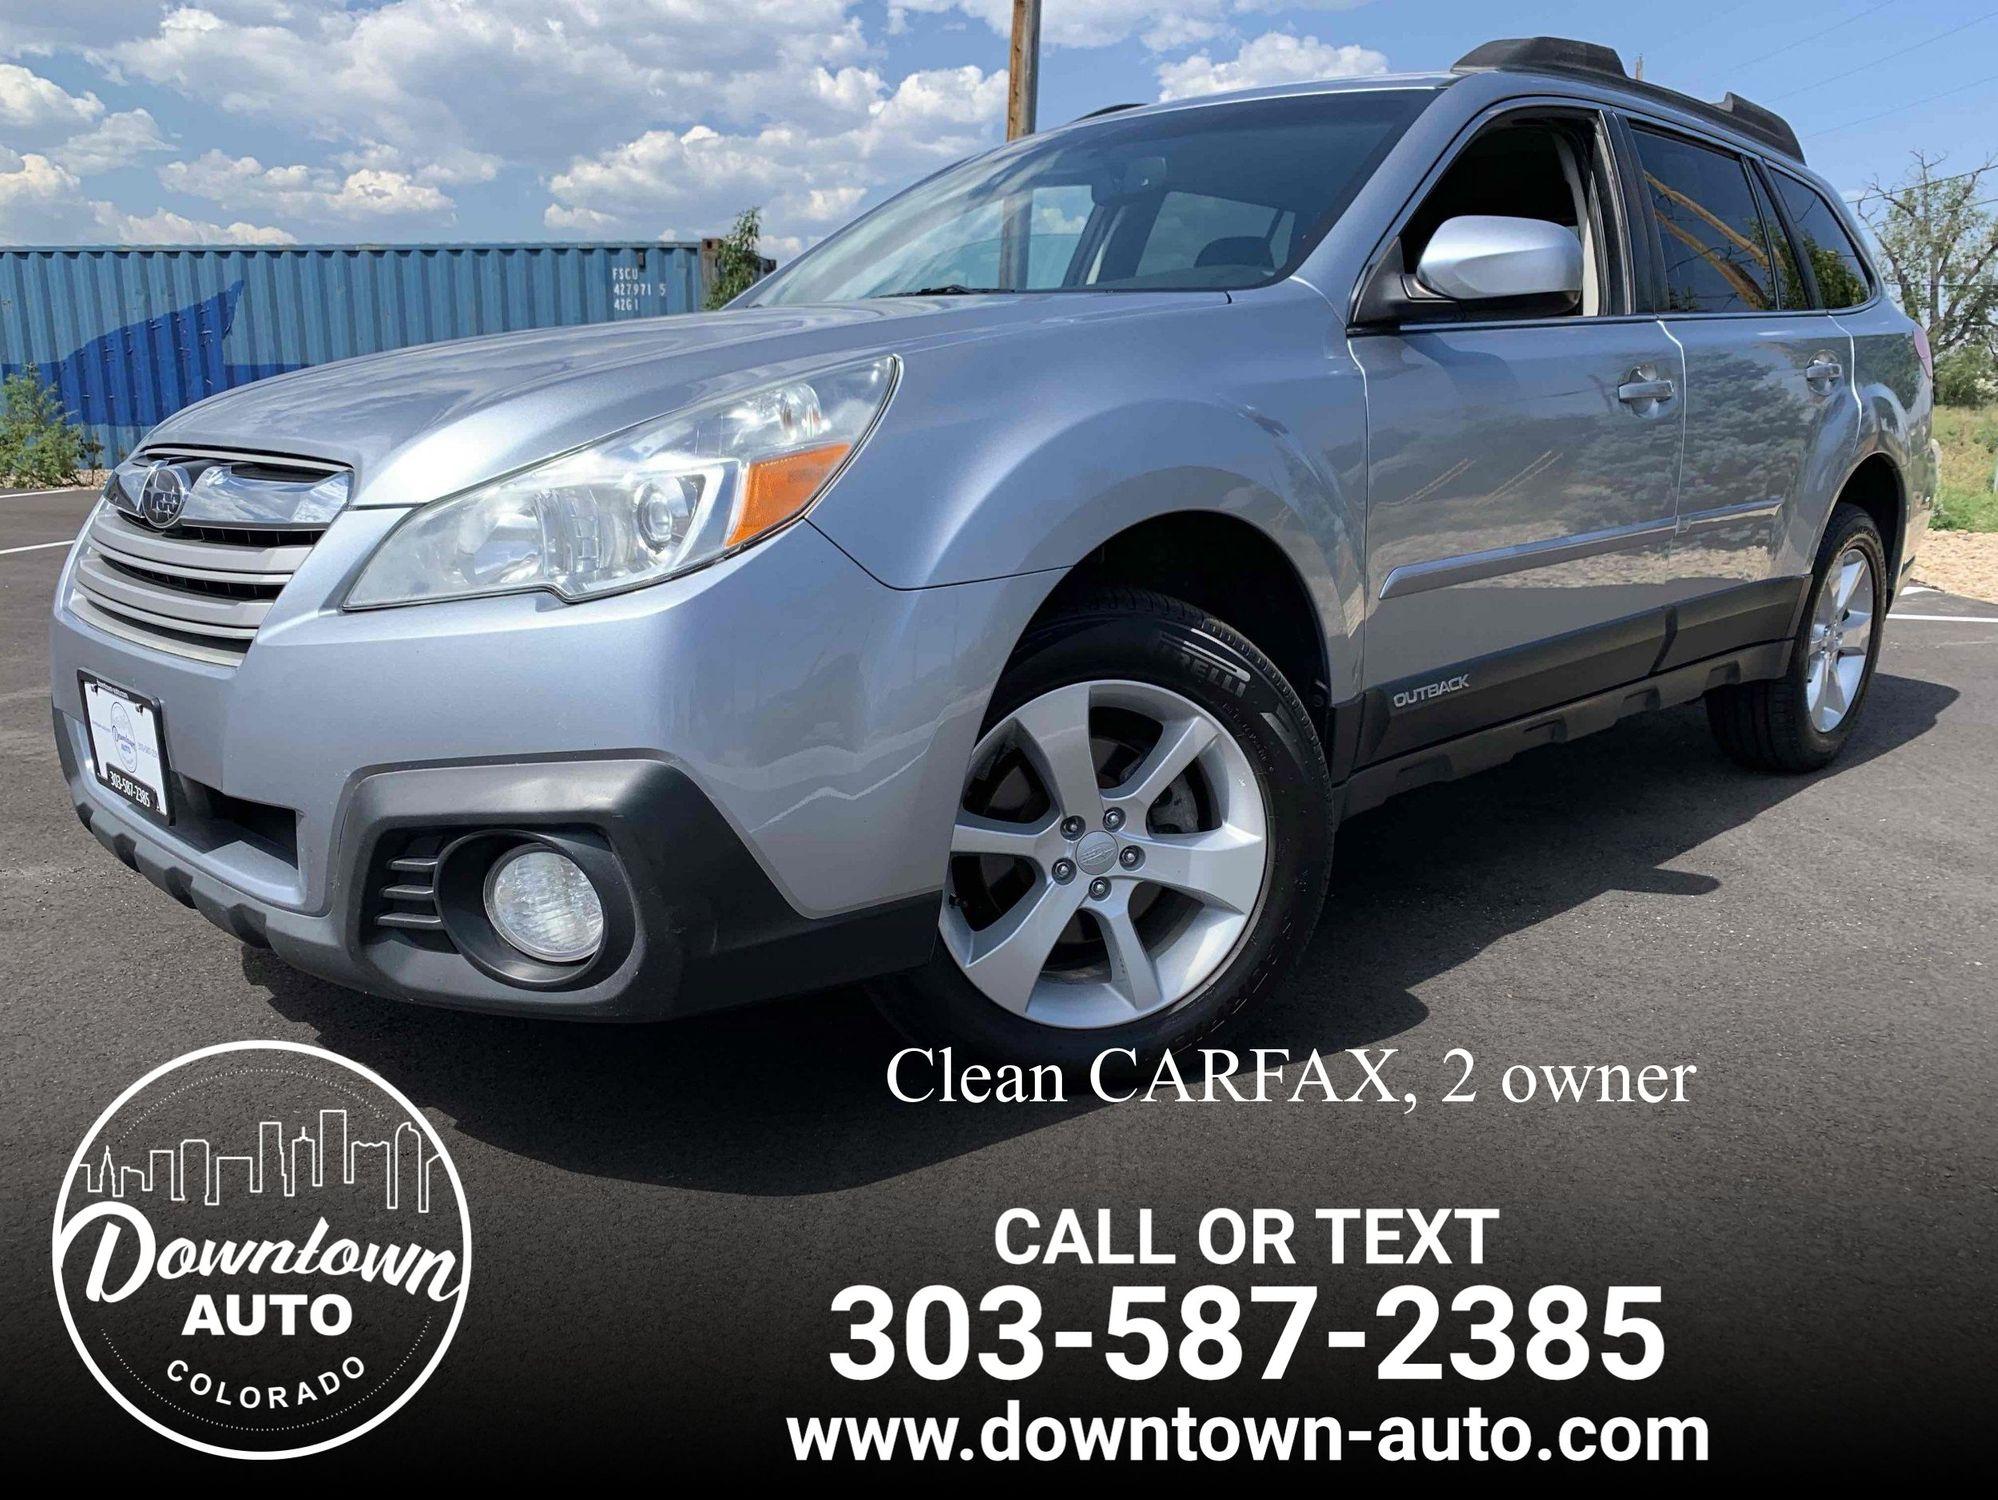 2013 Subaru Outback 2 5i Premium | Downtown Auto